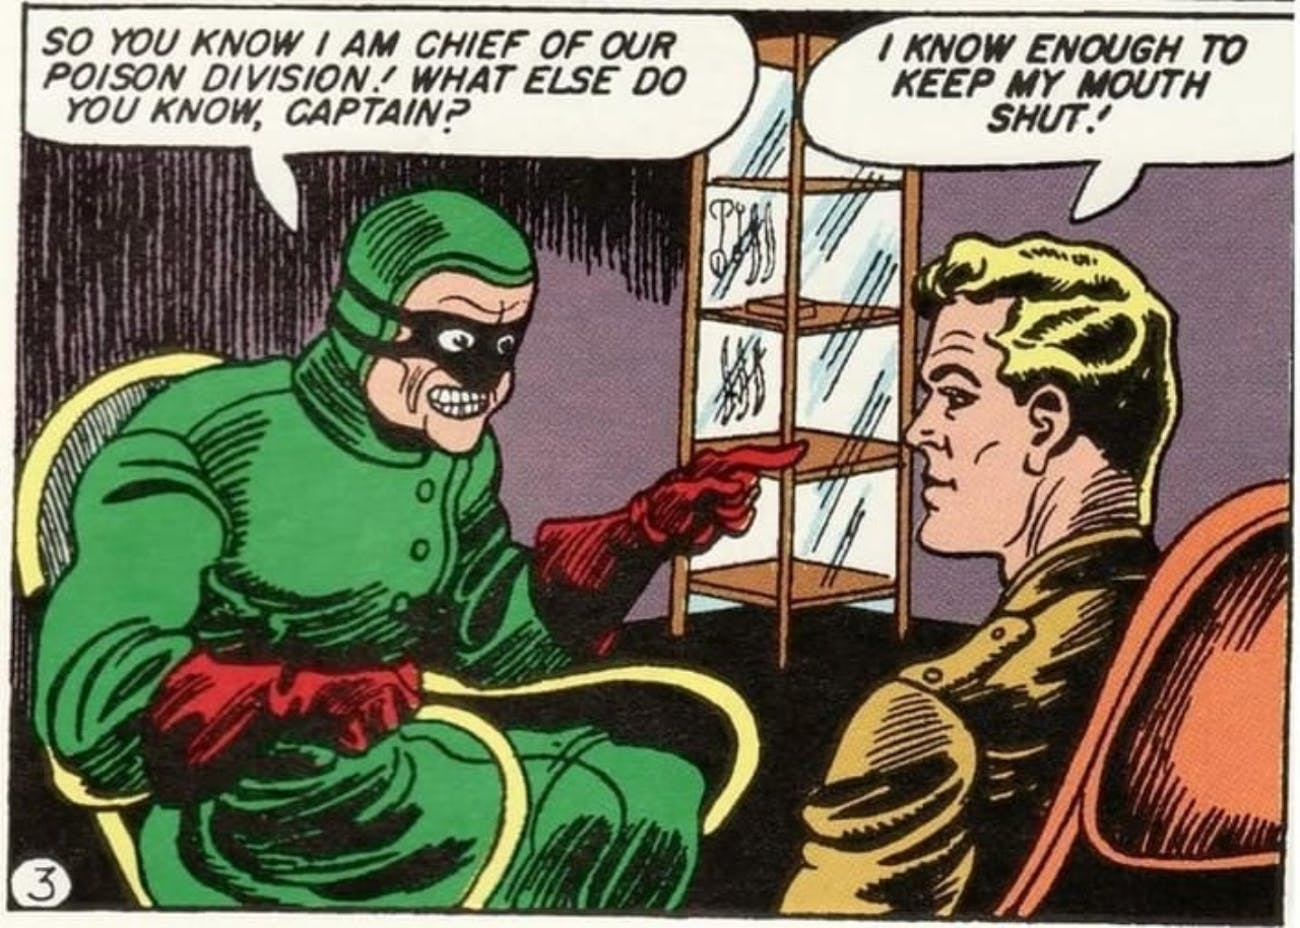 Doctor Poison Wonder Woman